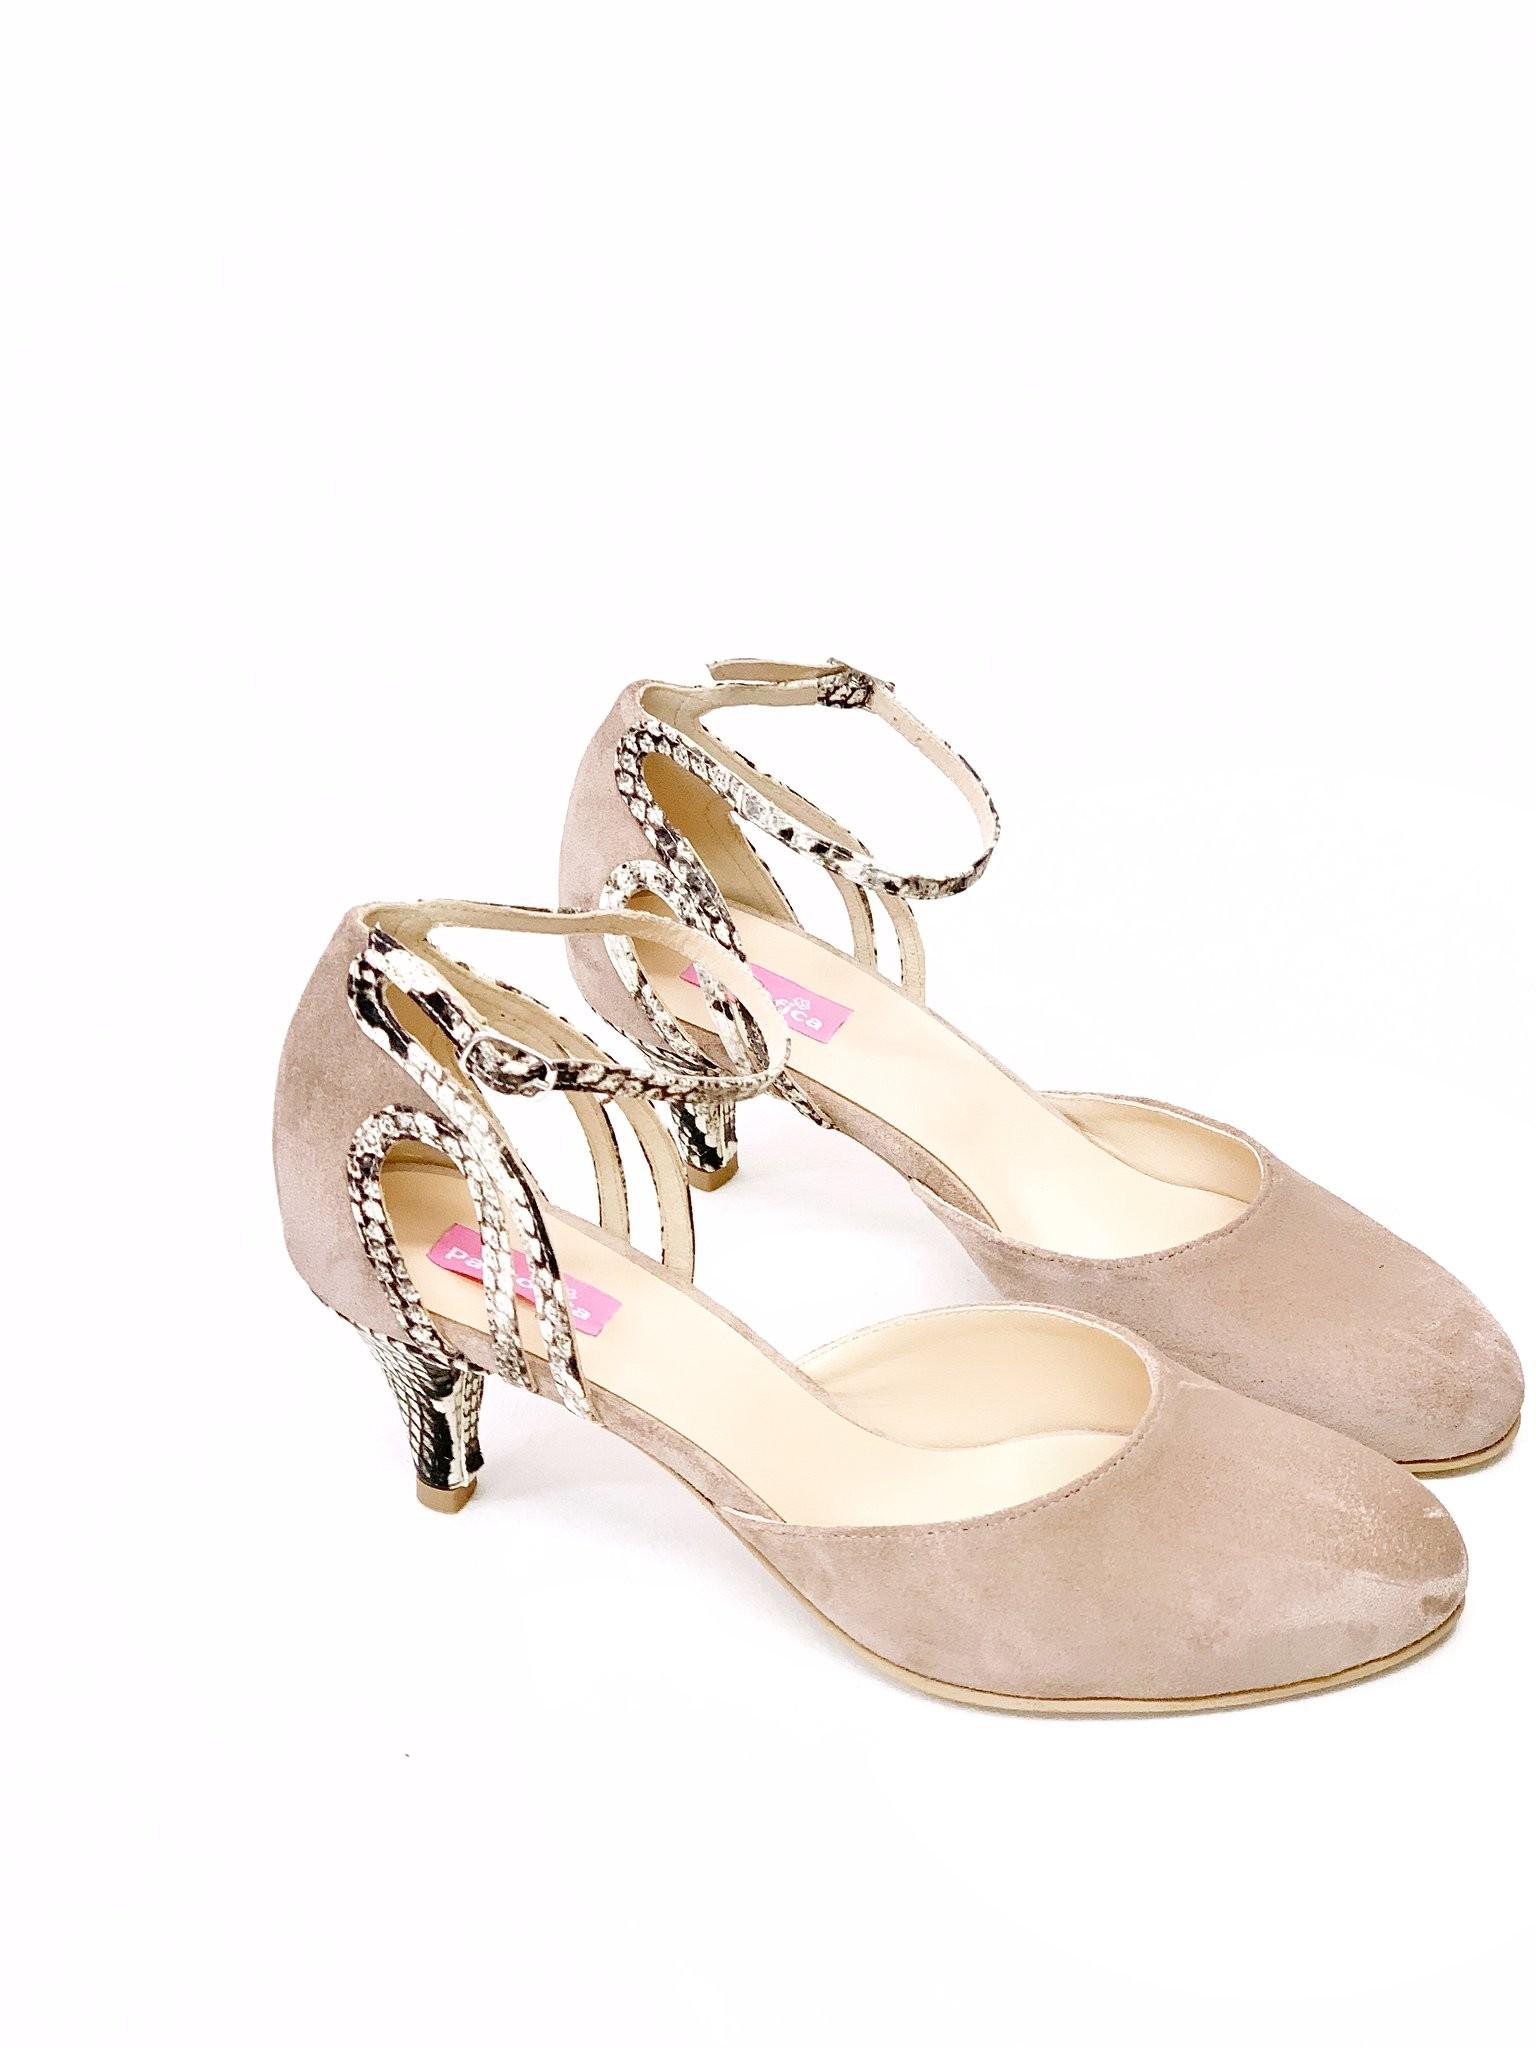 Pantofi Mistify